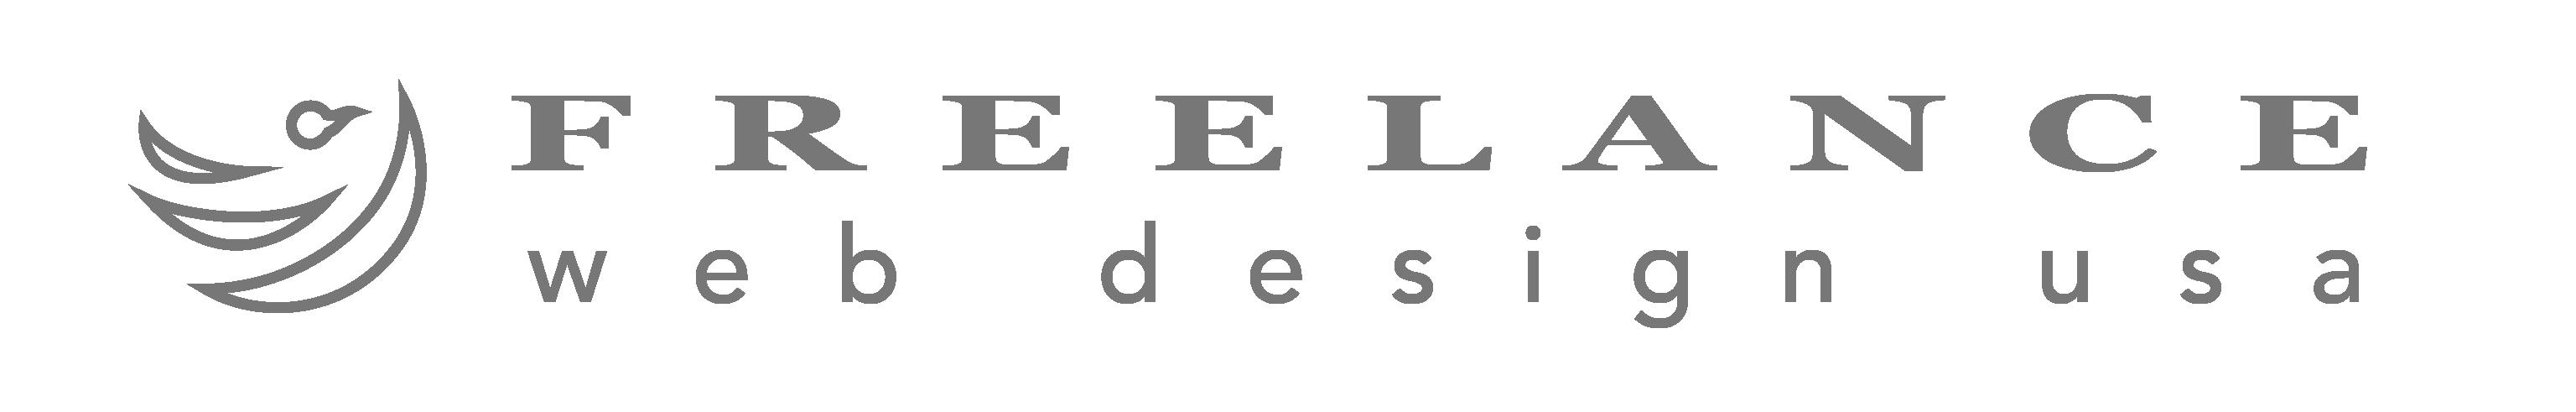 freelance web design usa logo